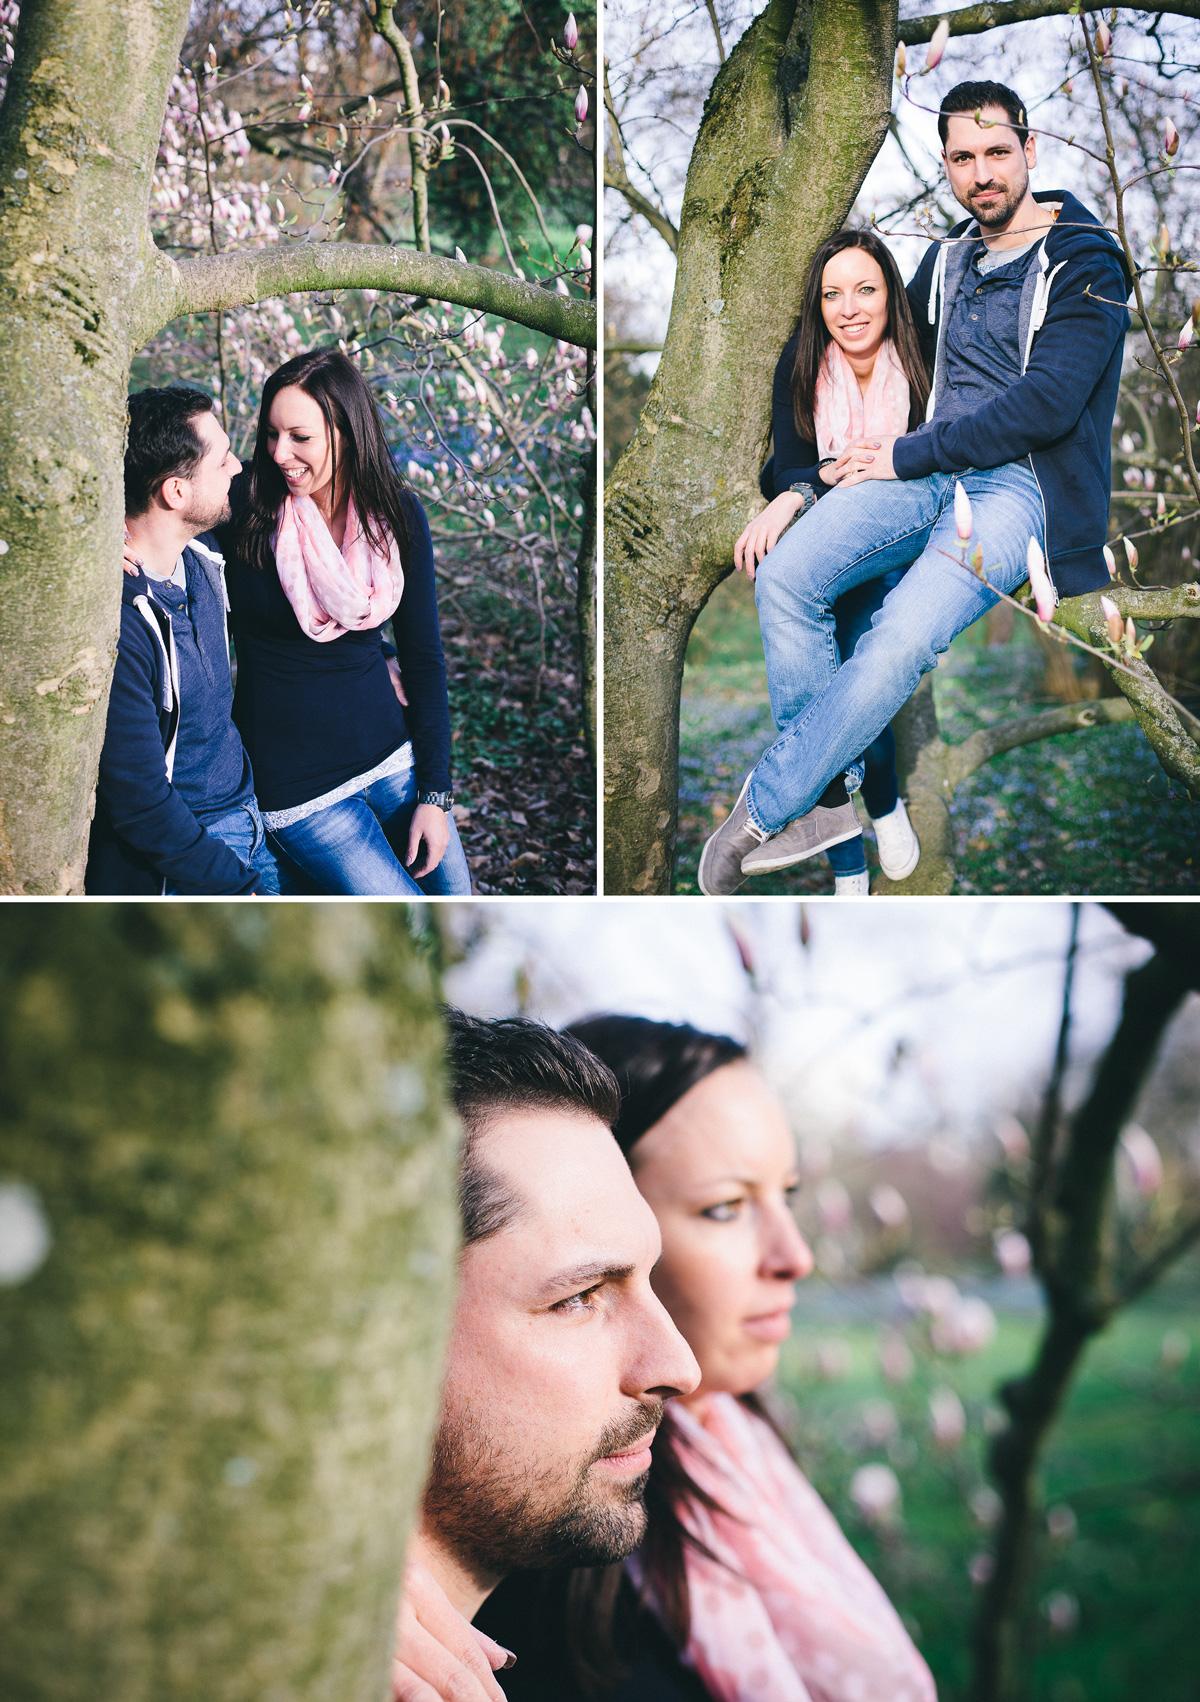 Sabine-und-Timo-Engagement-Foto-Avec-Amis-10